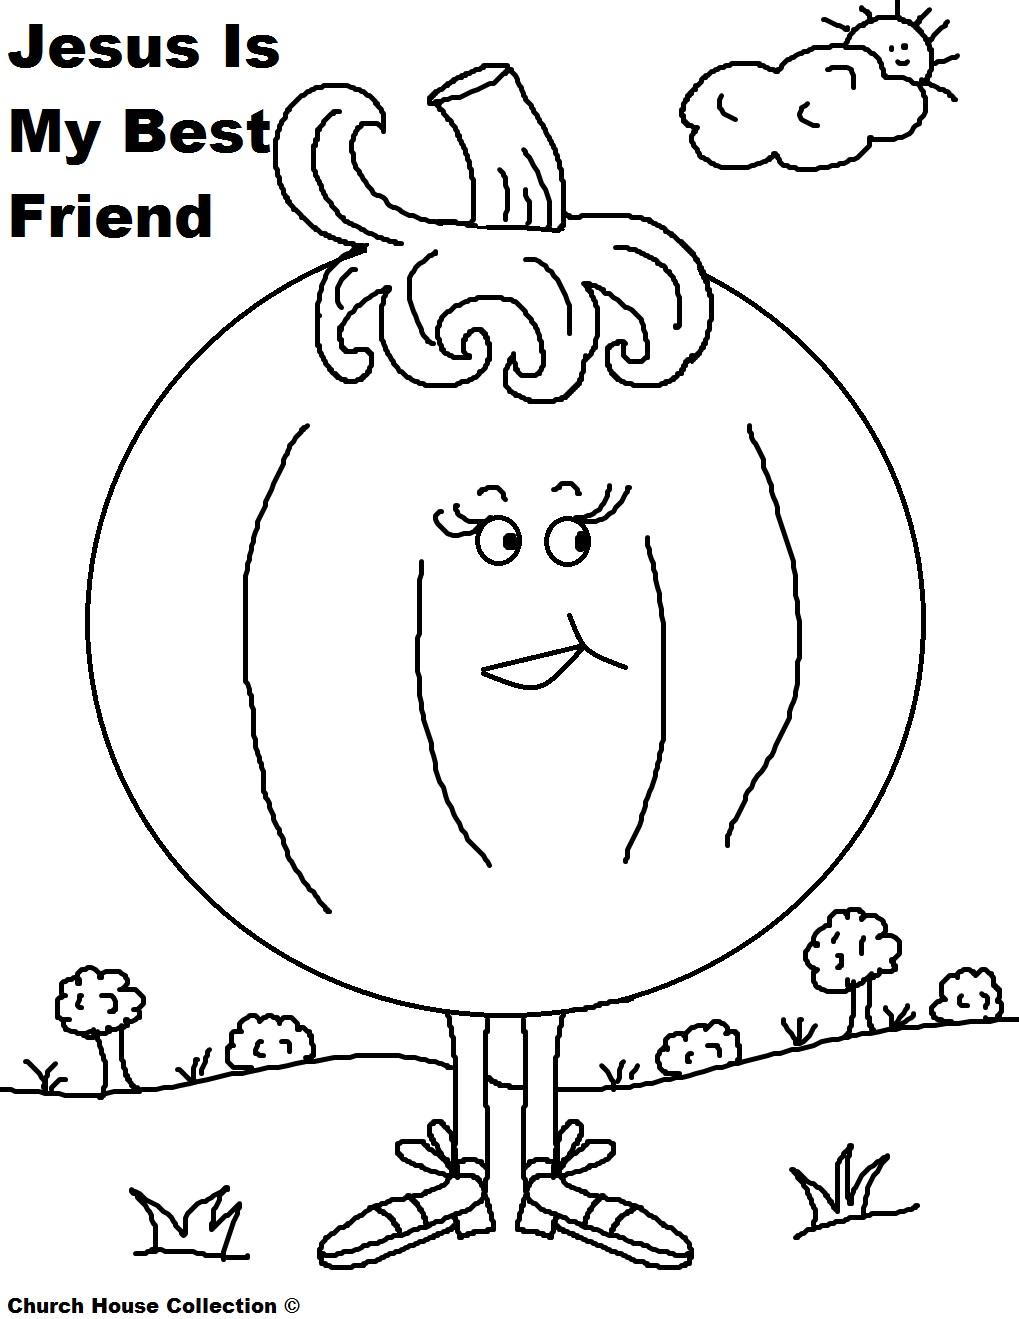 1019x1319 Best Friend Coloring Pages